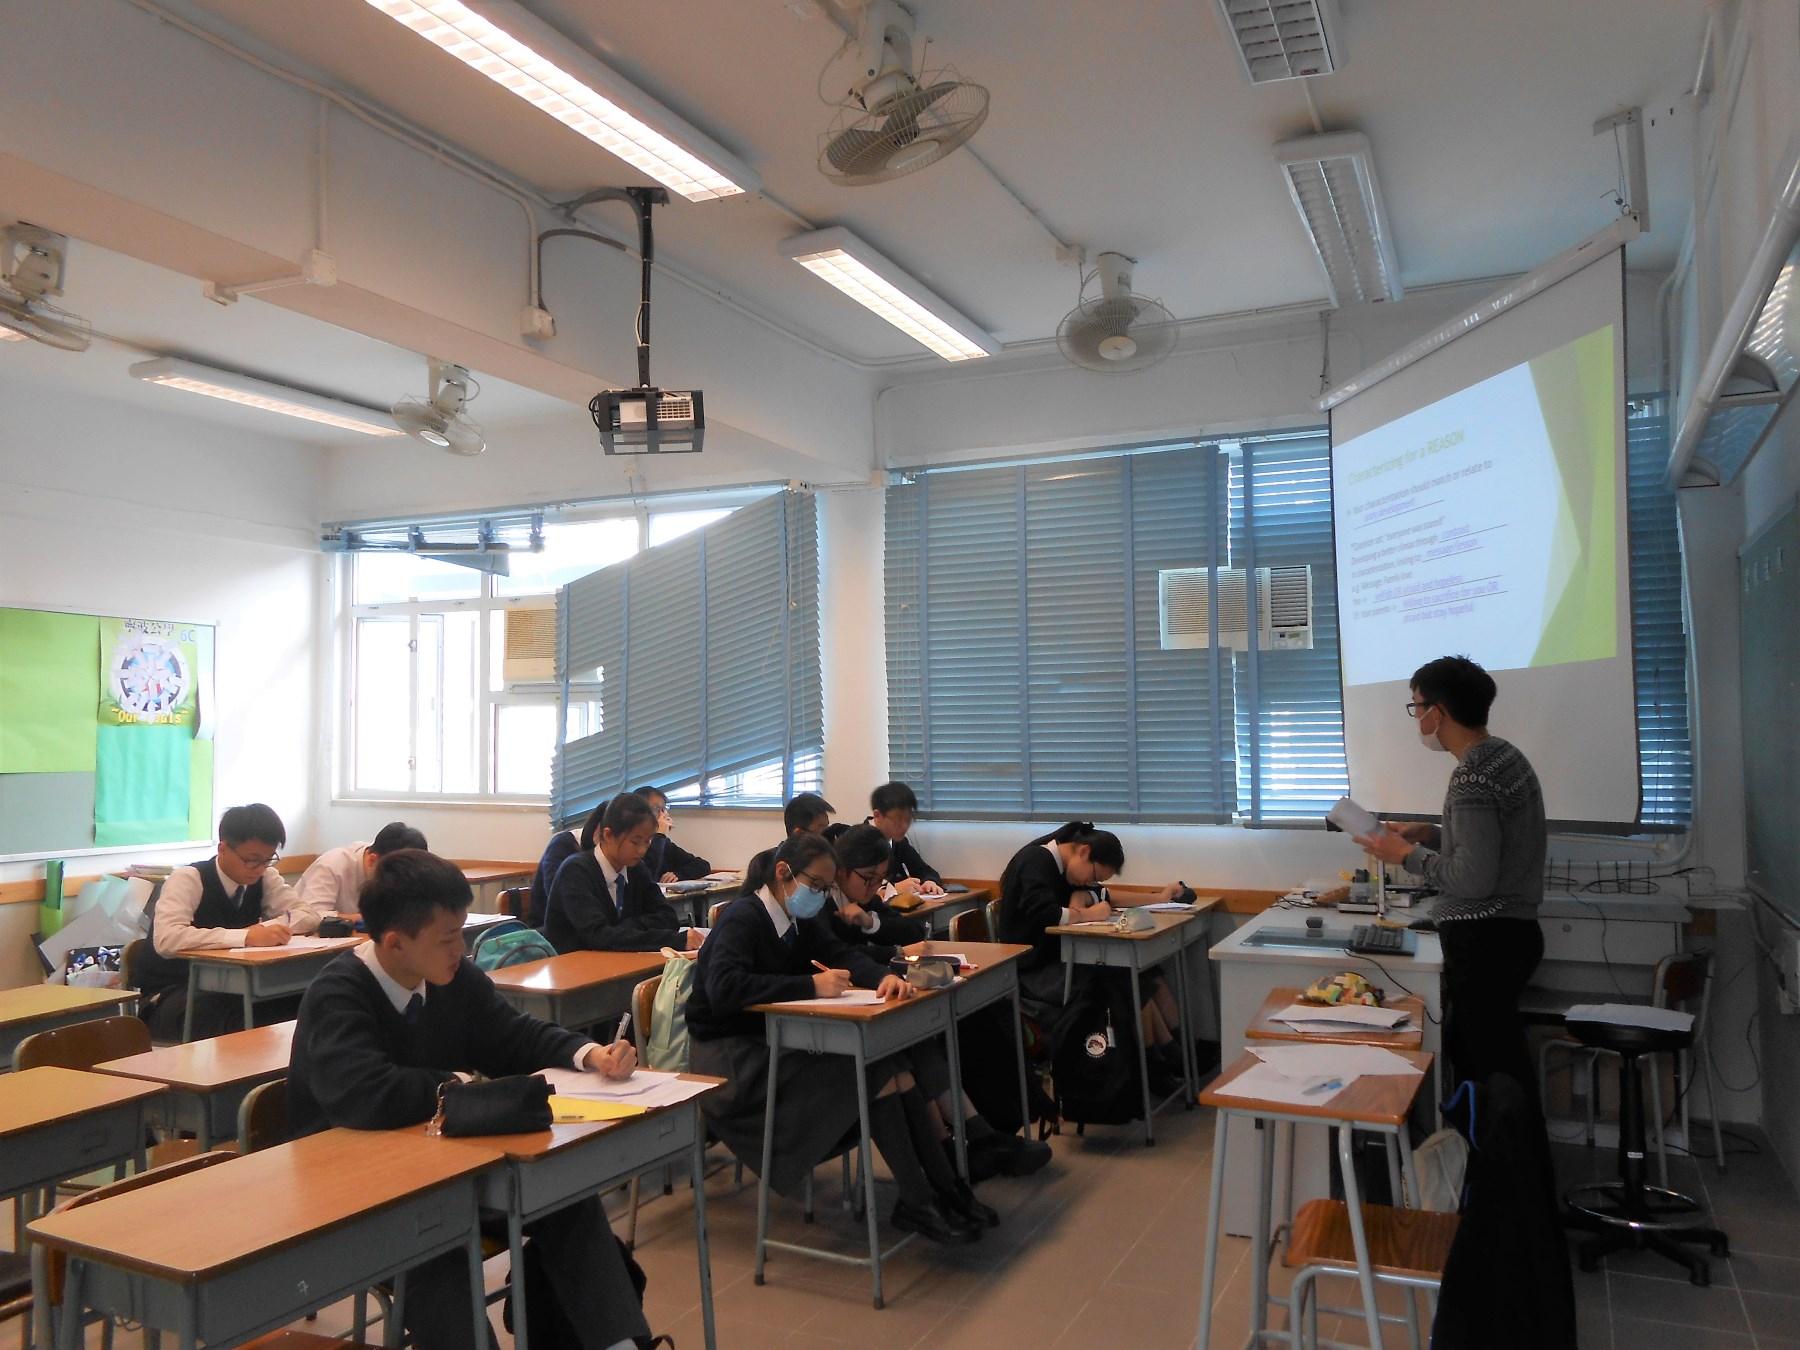 http://npc.edu.hk/sites/default/files/dscn9823.jpg